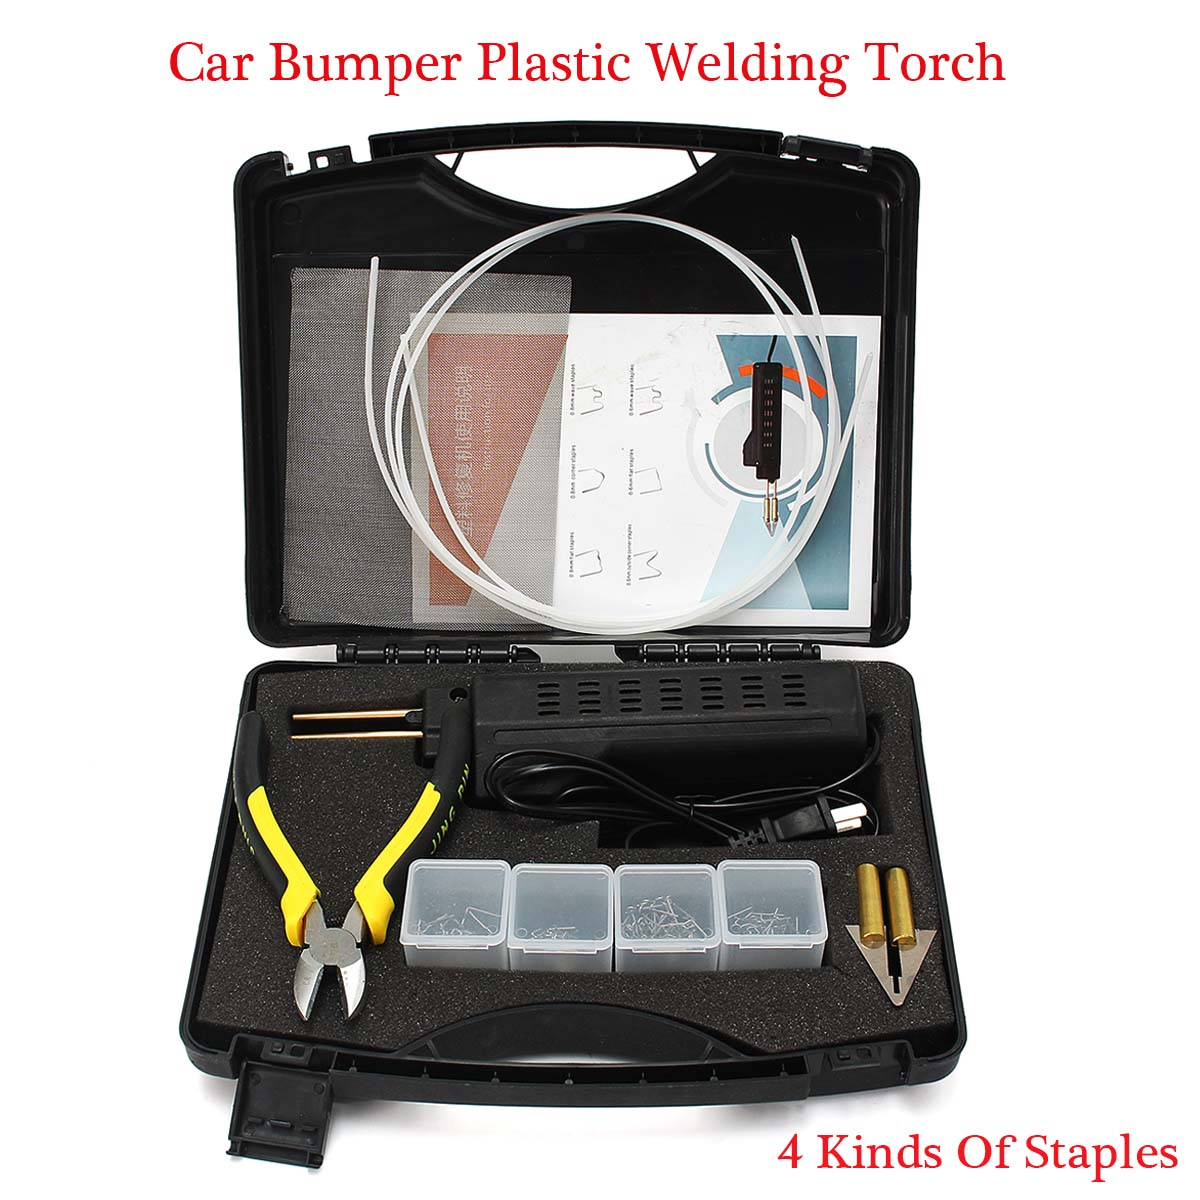 Tools : 220V Hot Stapler Car Bumper Plastic Welding Torch Fairing Auto Body Welding Machine Welding Tool Repair Kit With 200 Staples